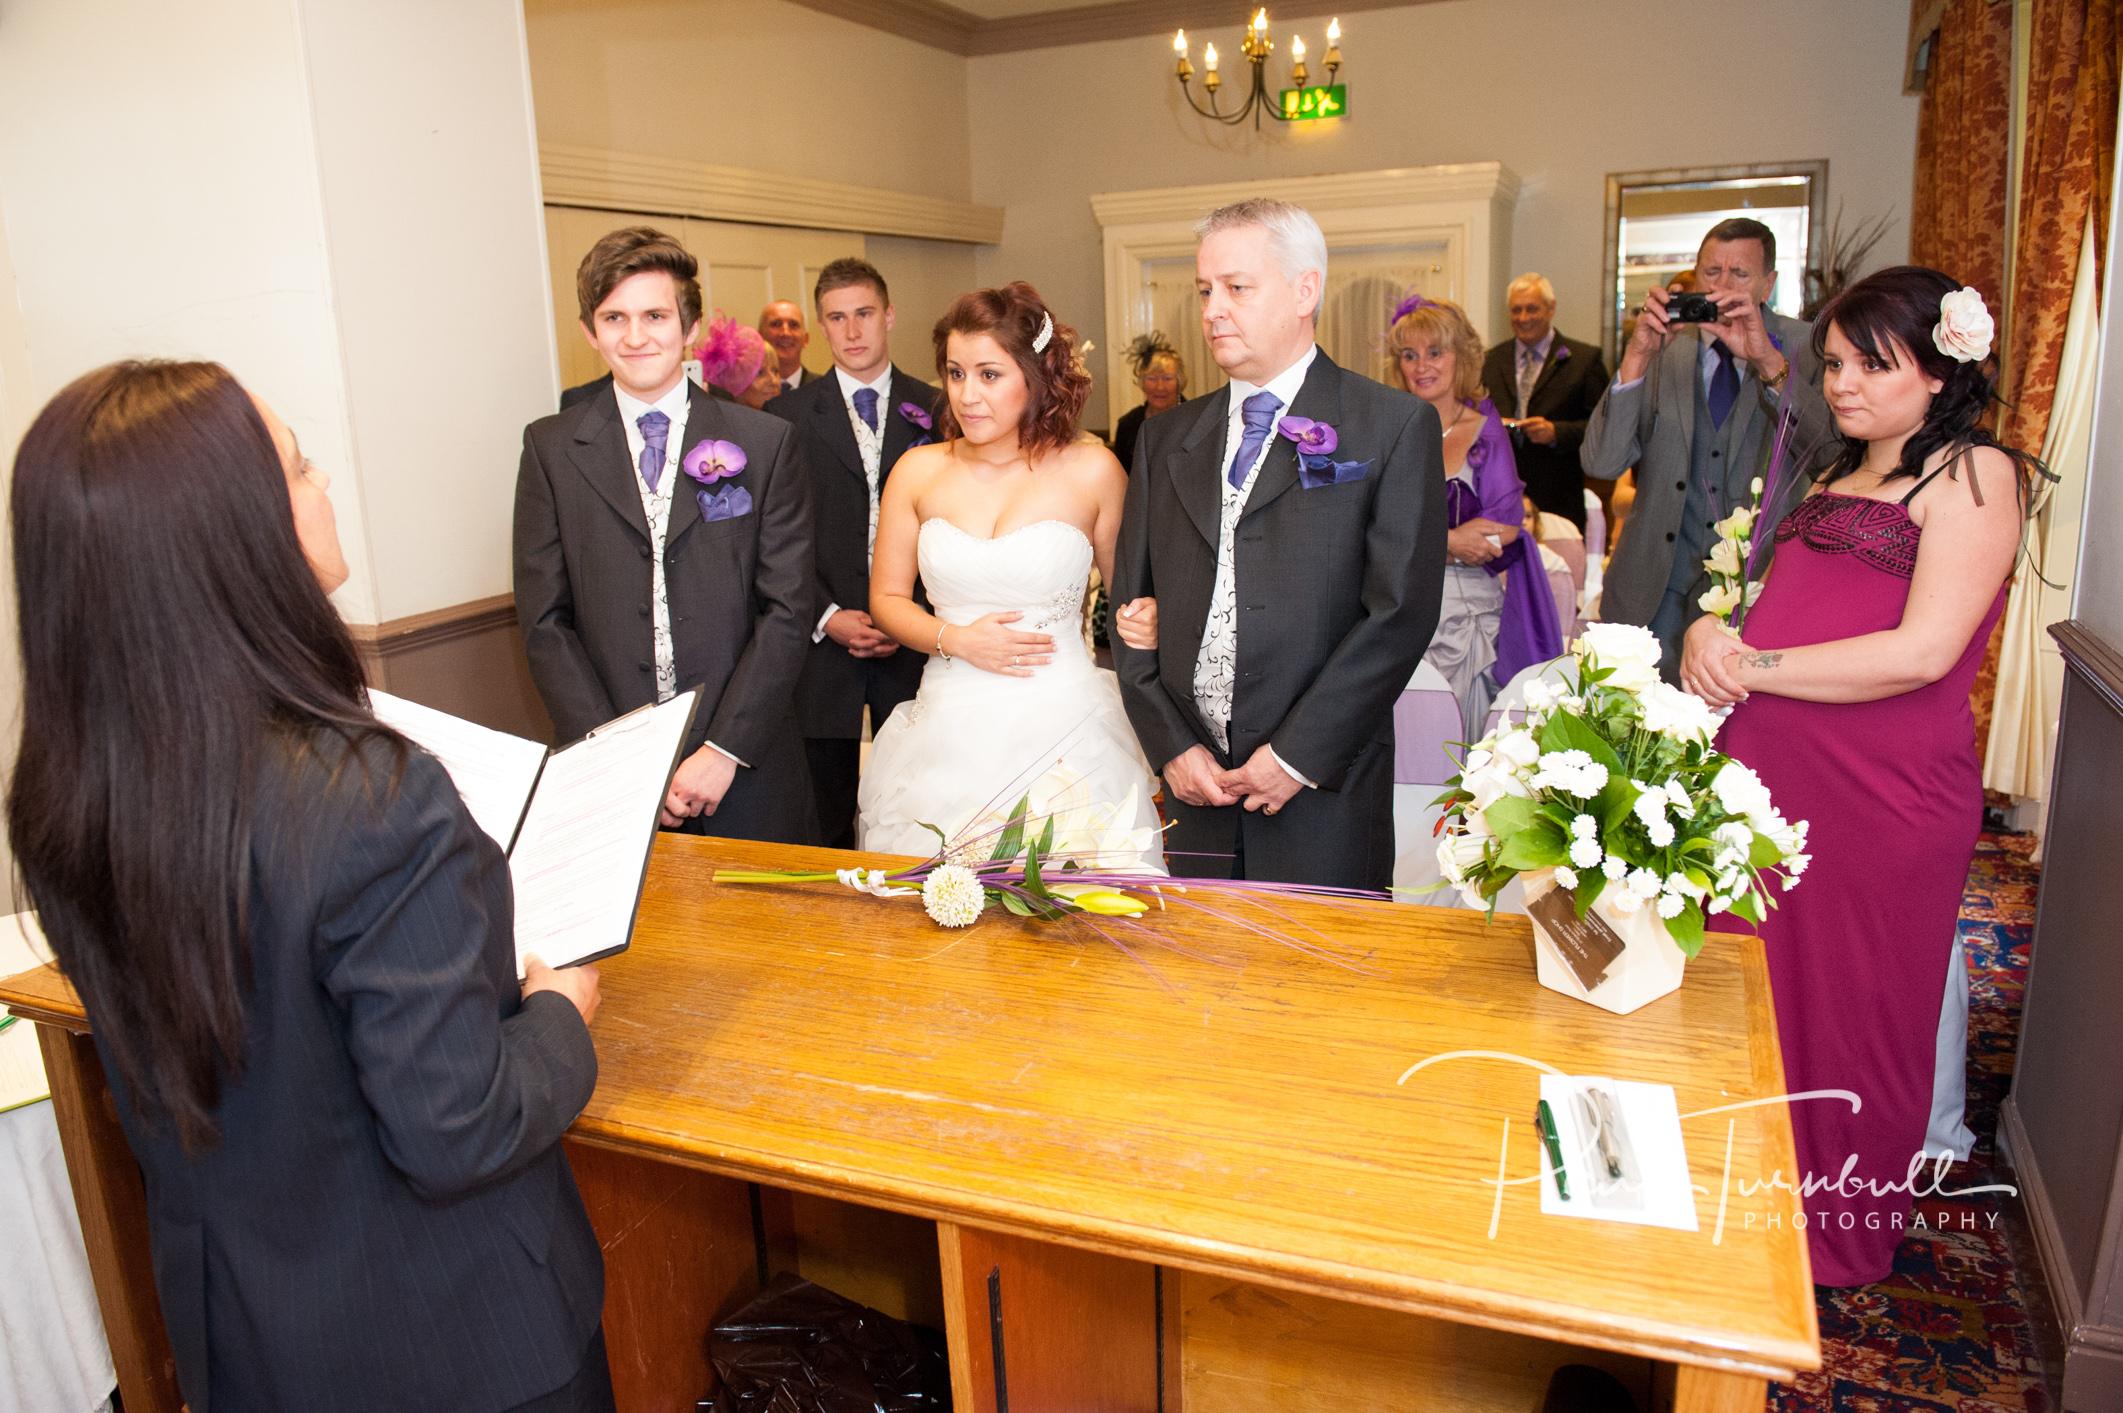 wedding-photography-healds-hall-liversedge-yorkshire-043.jpg